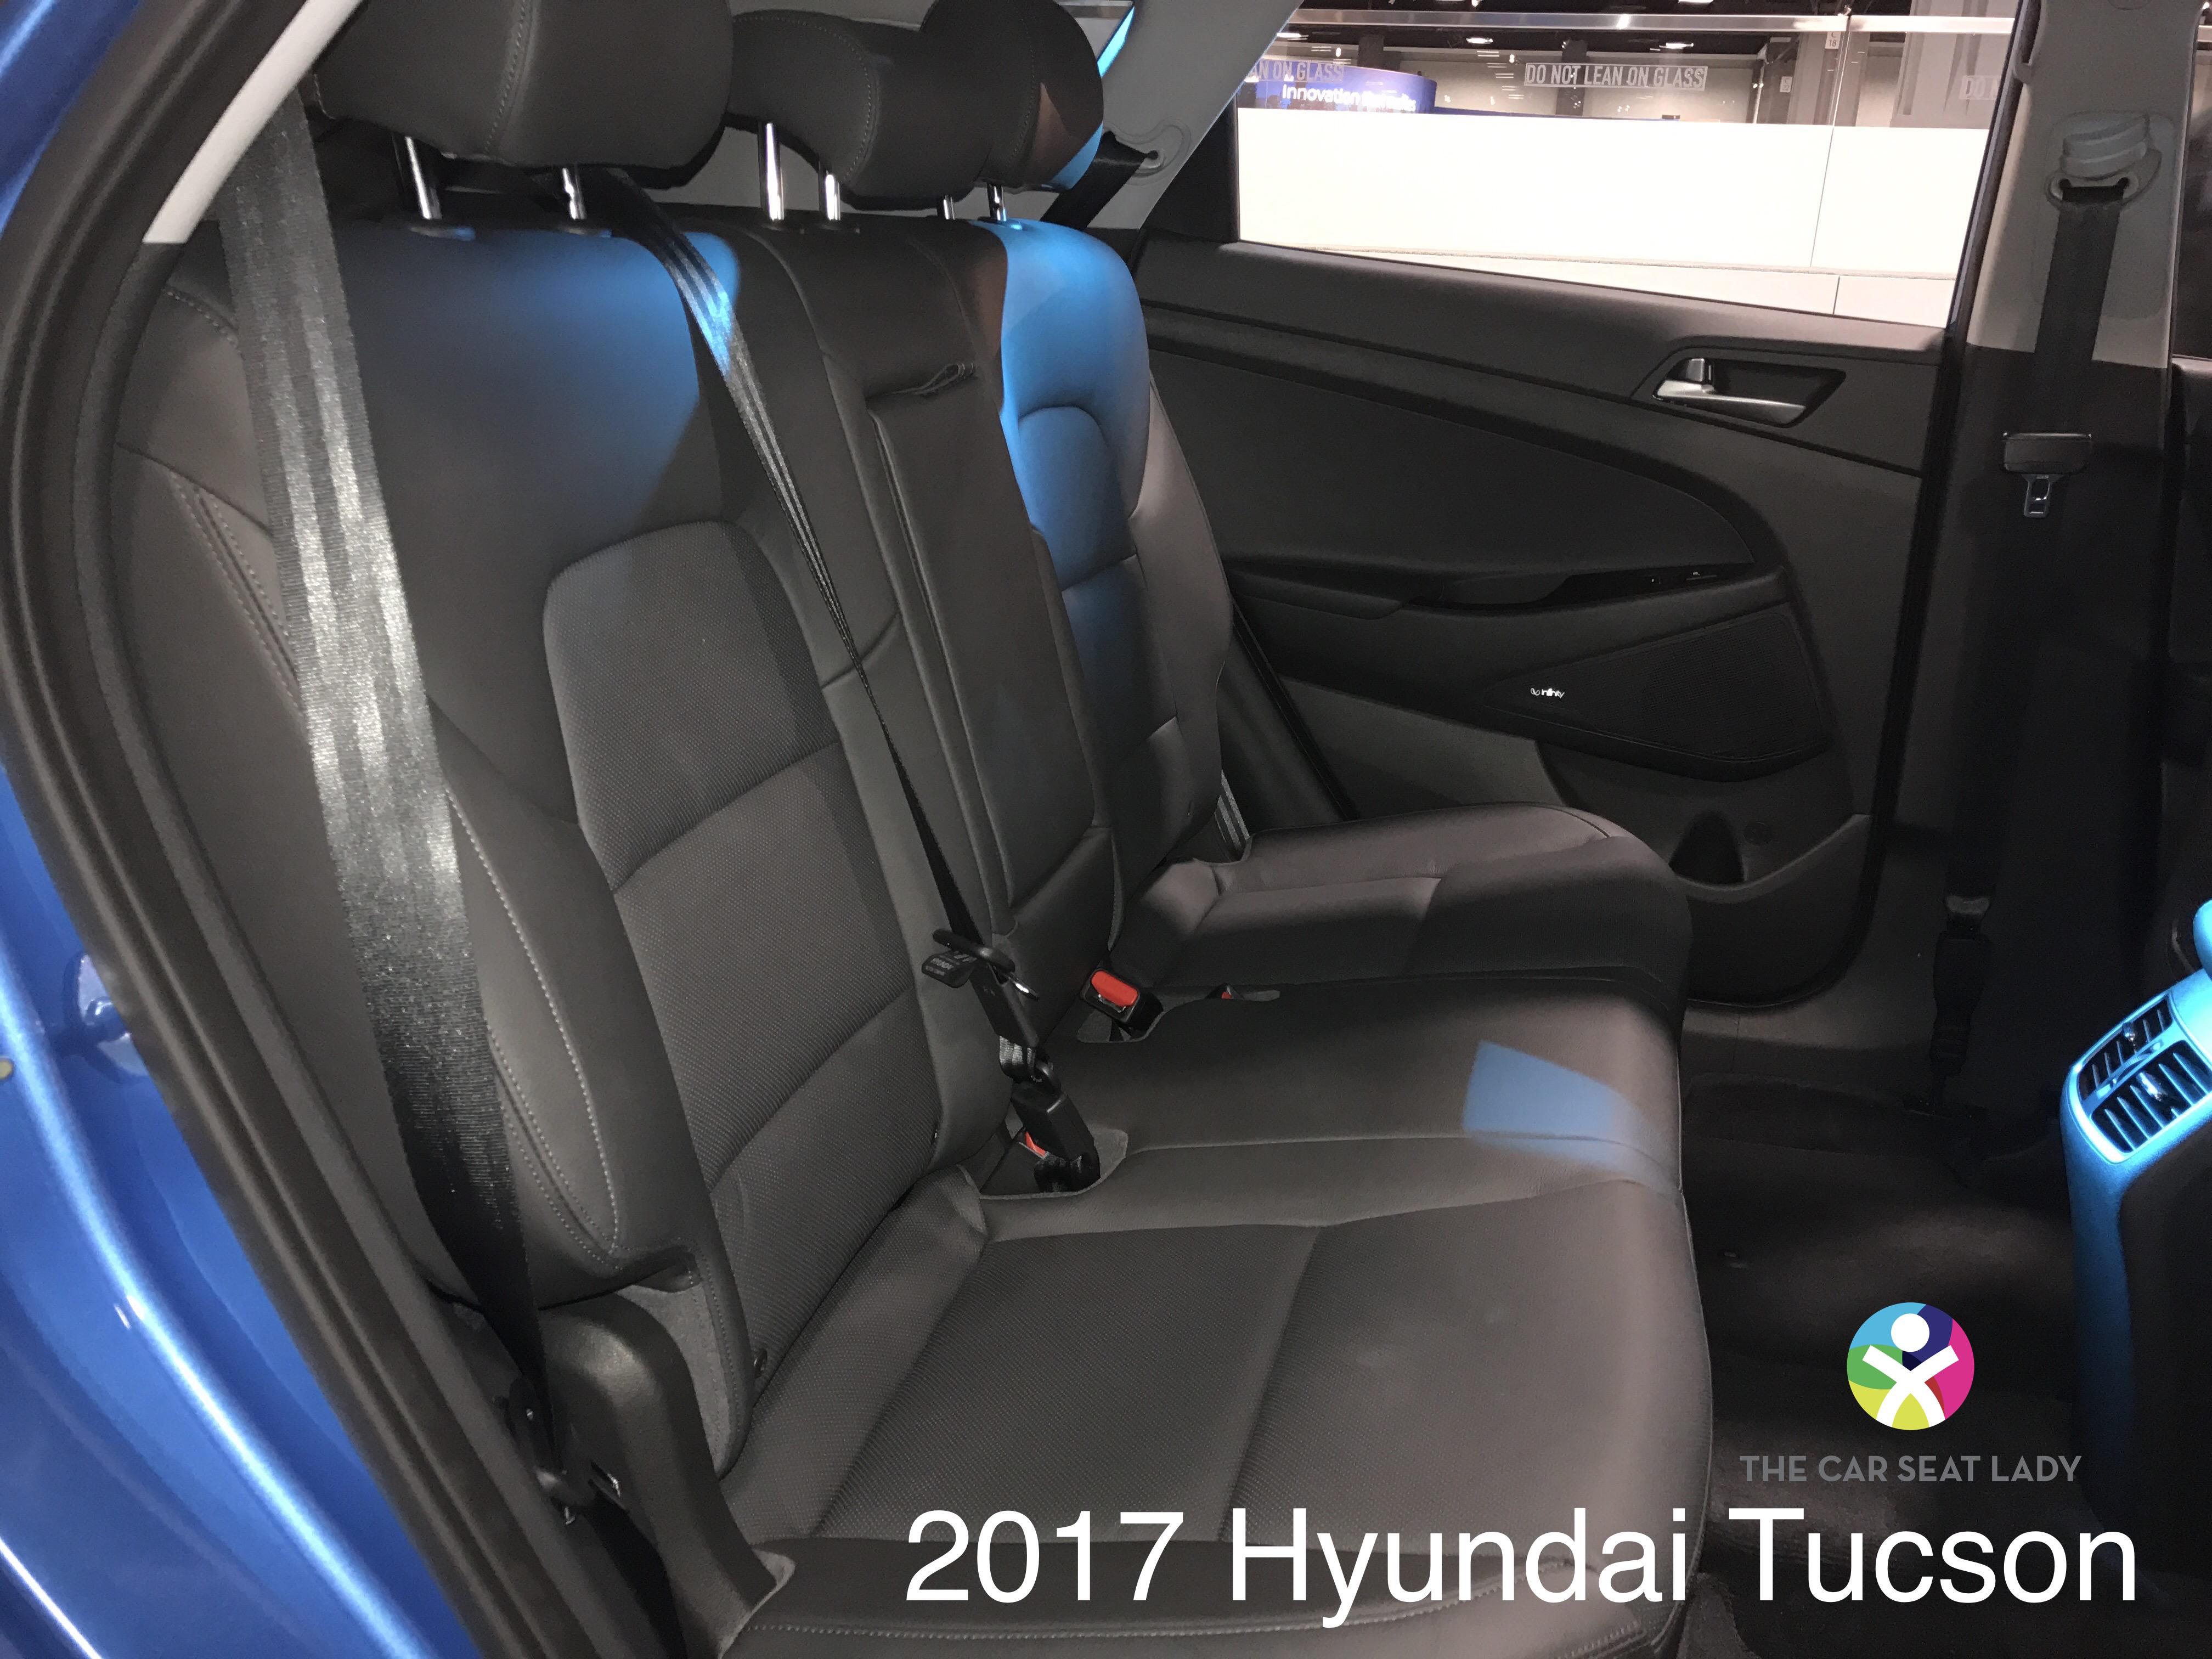 The Car Seat Ladyhyundai Tucson